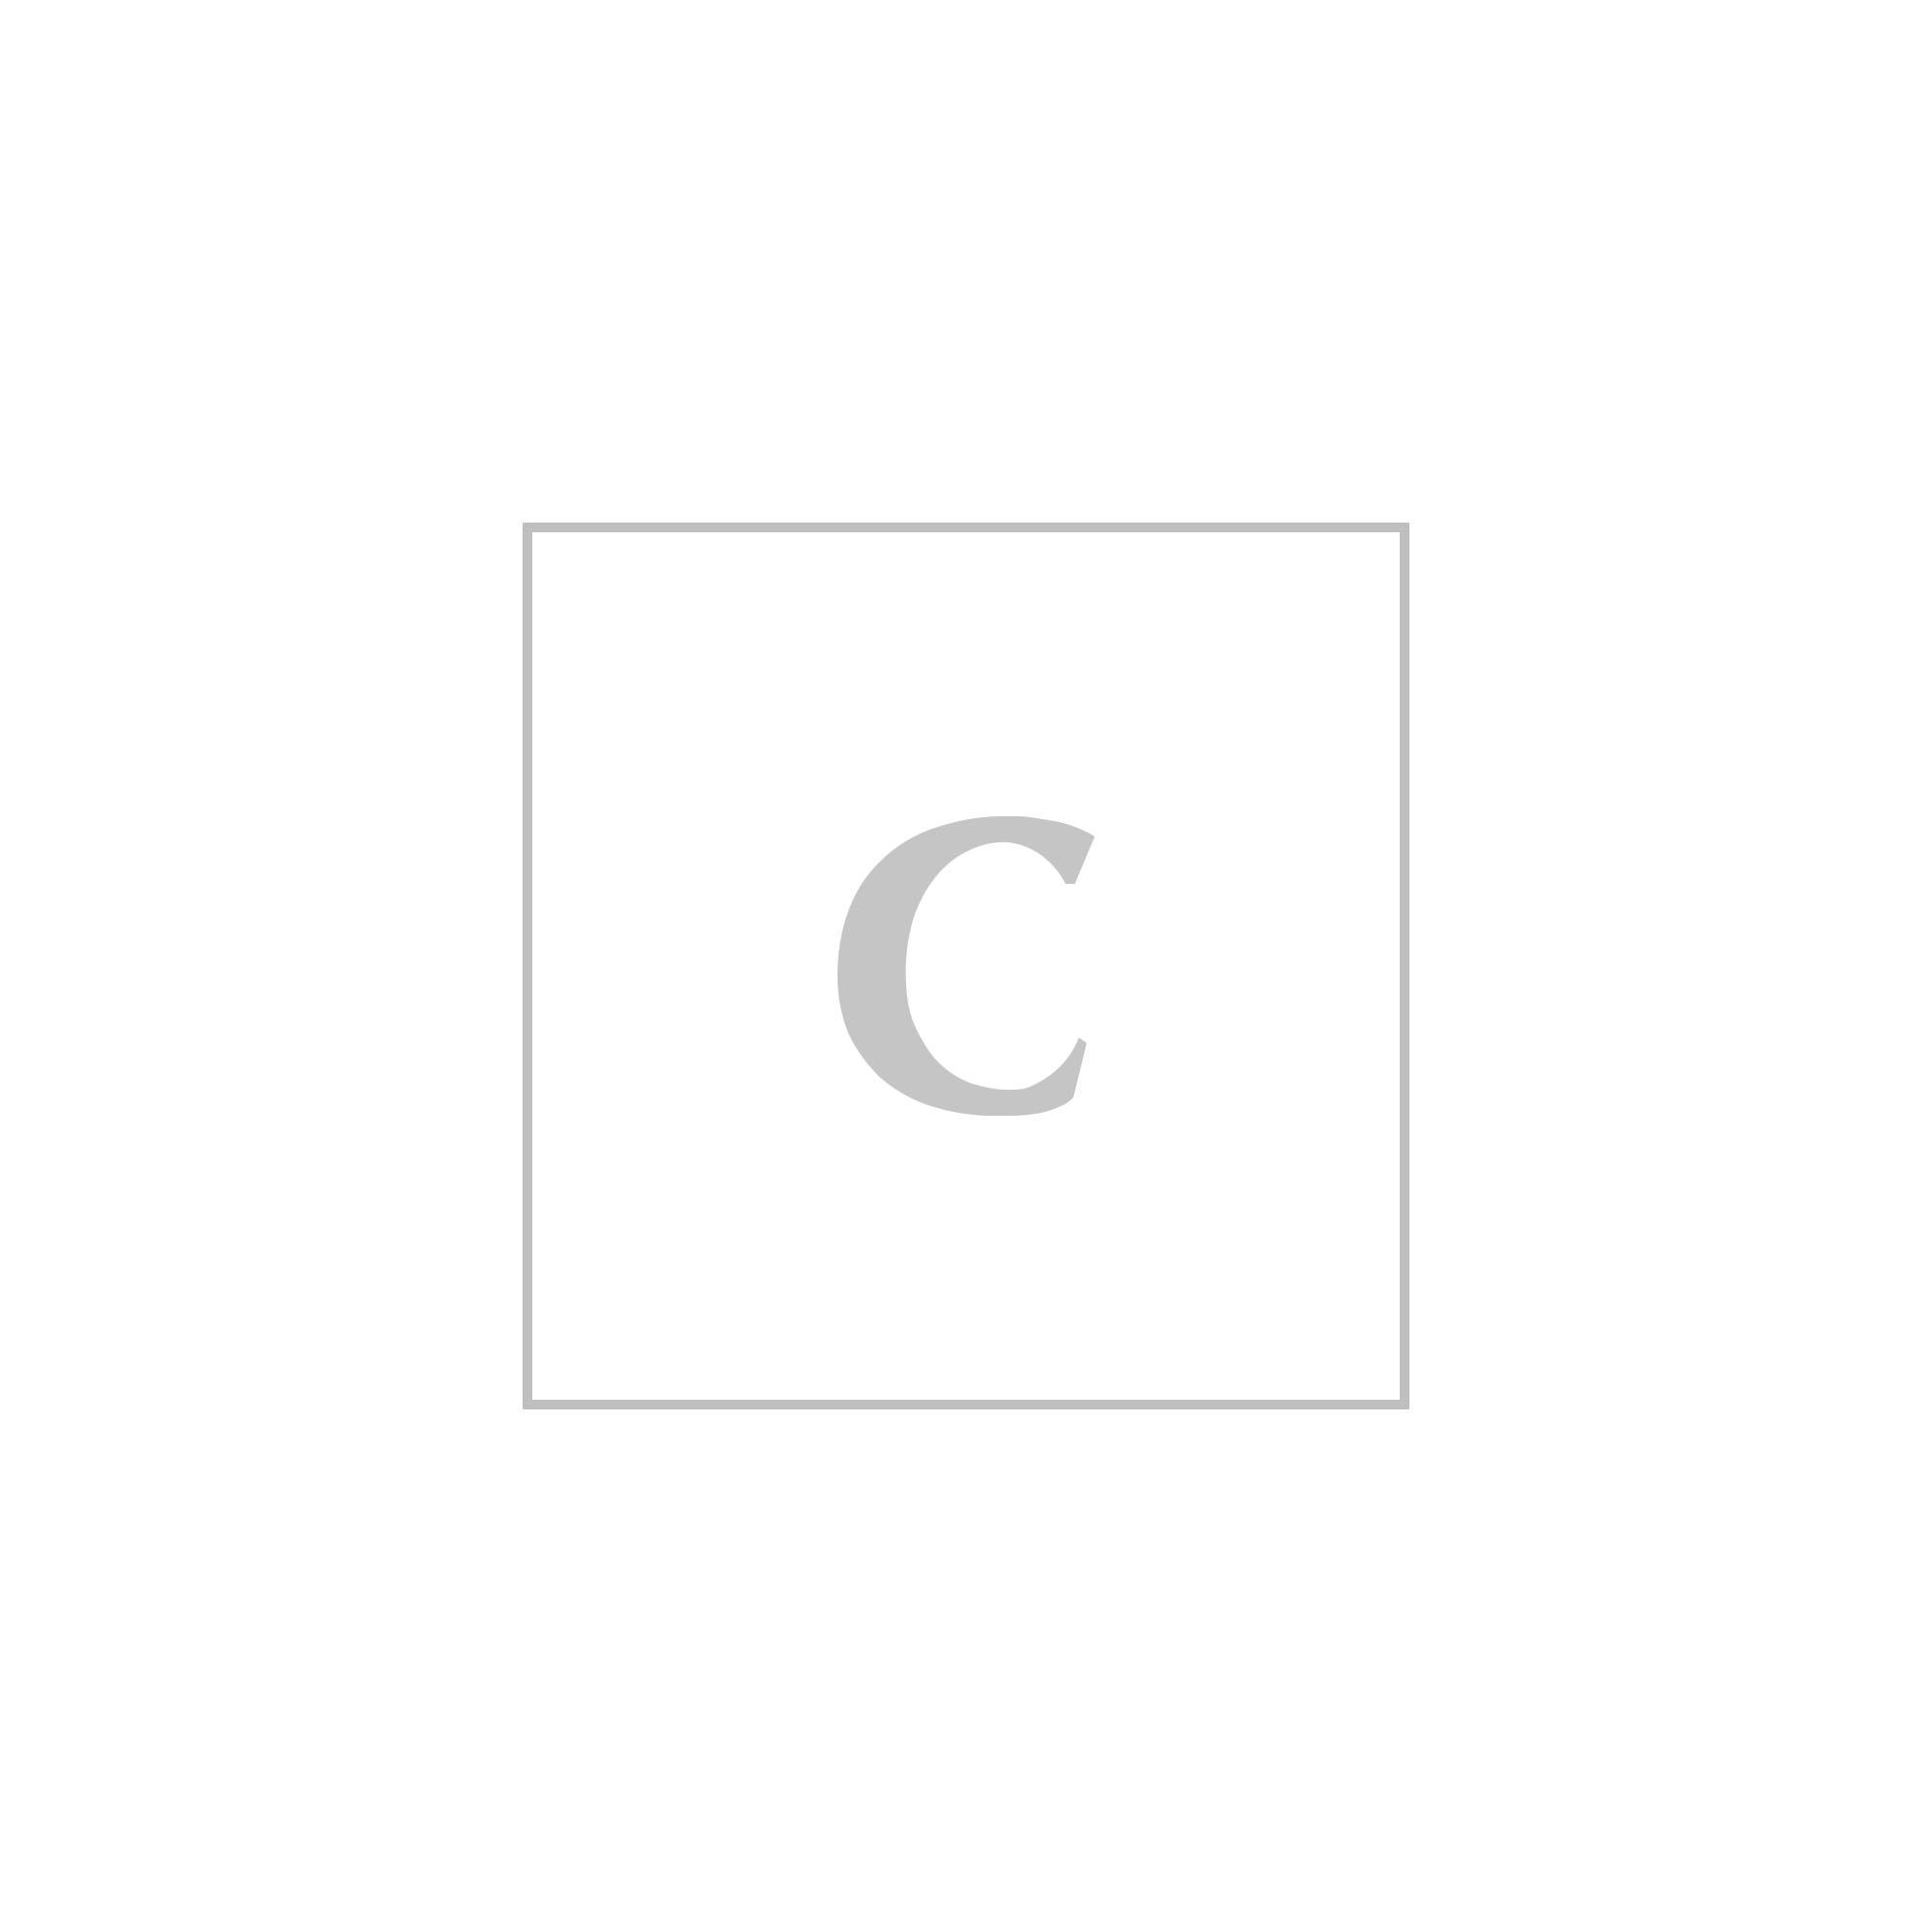 Celeste Nsp Update